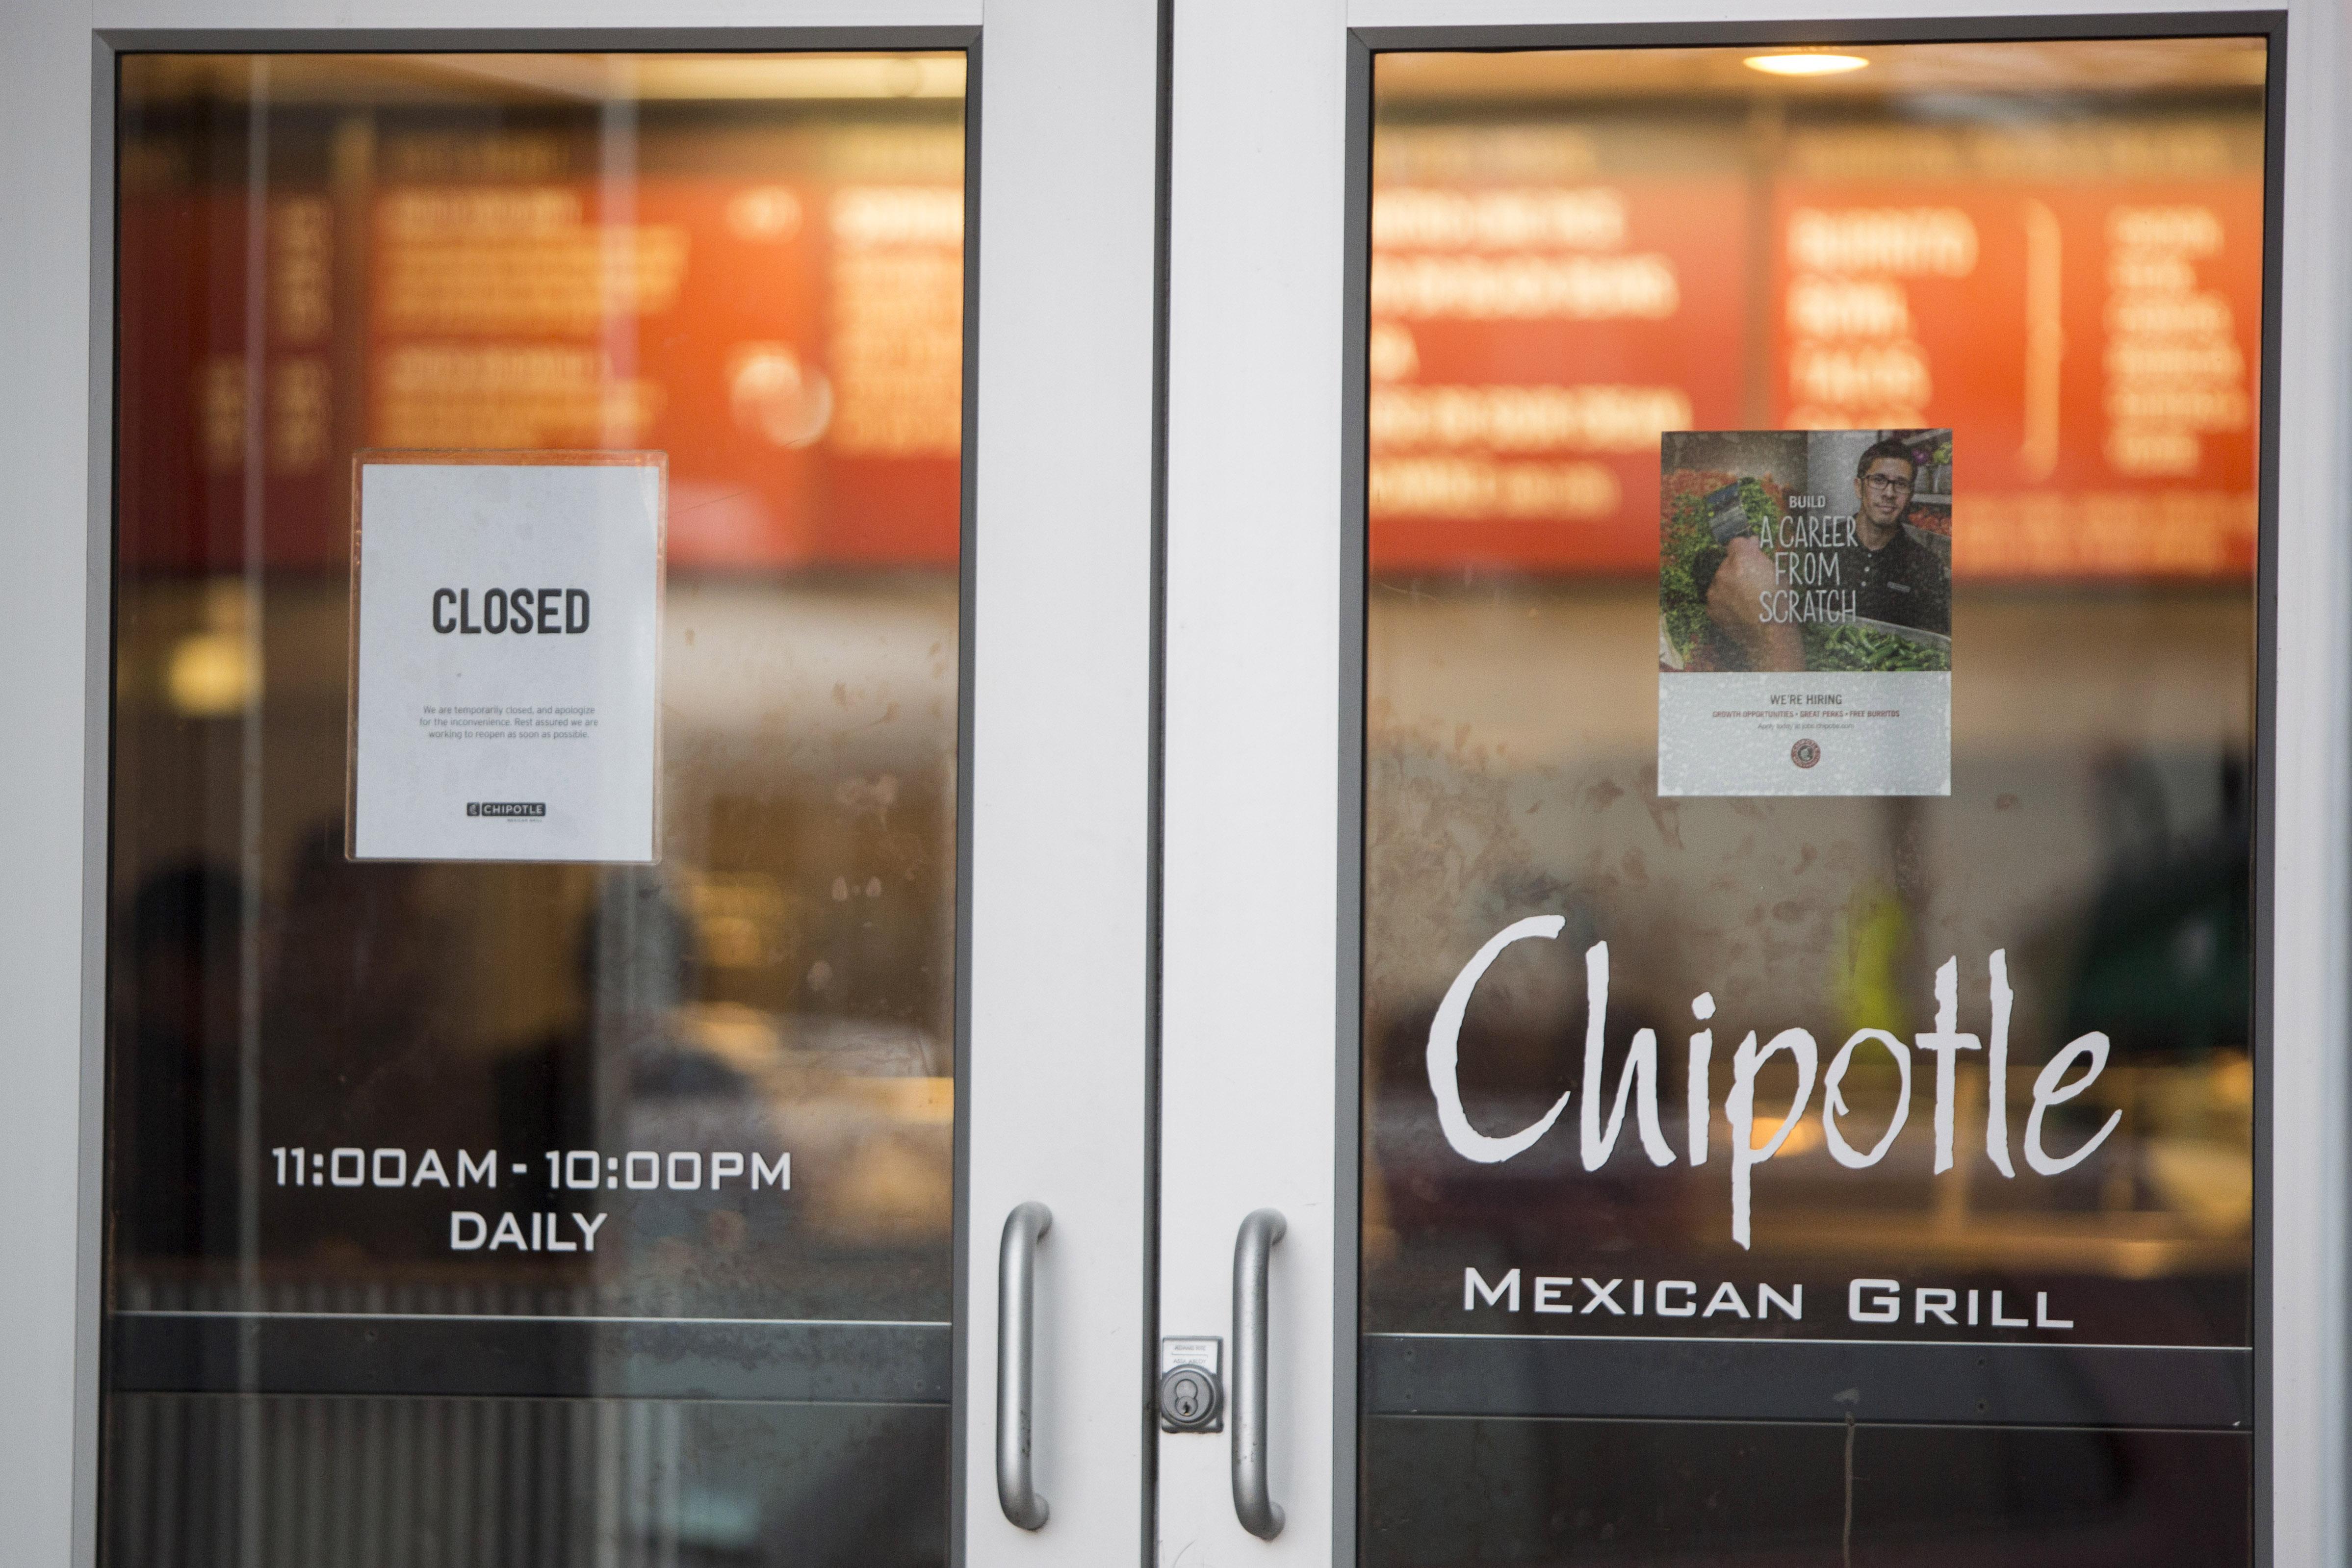 Chipotle closed Ohio location